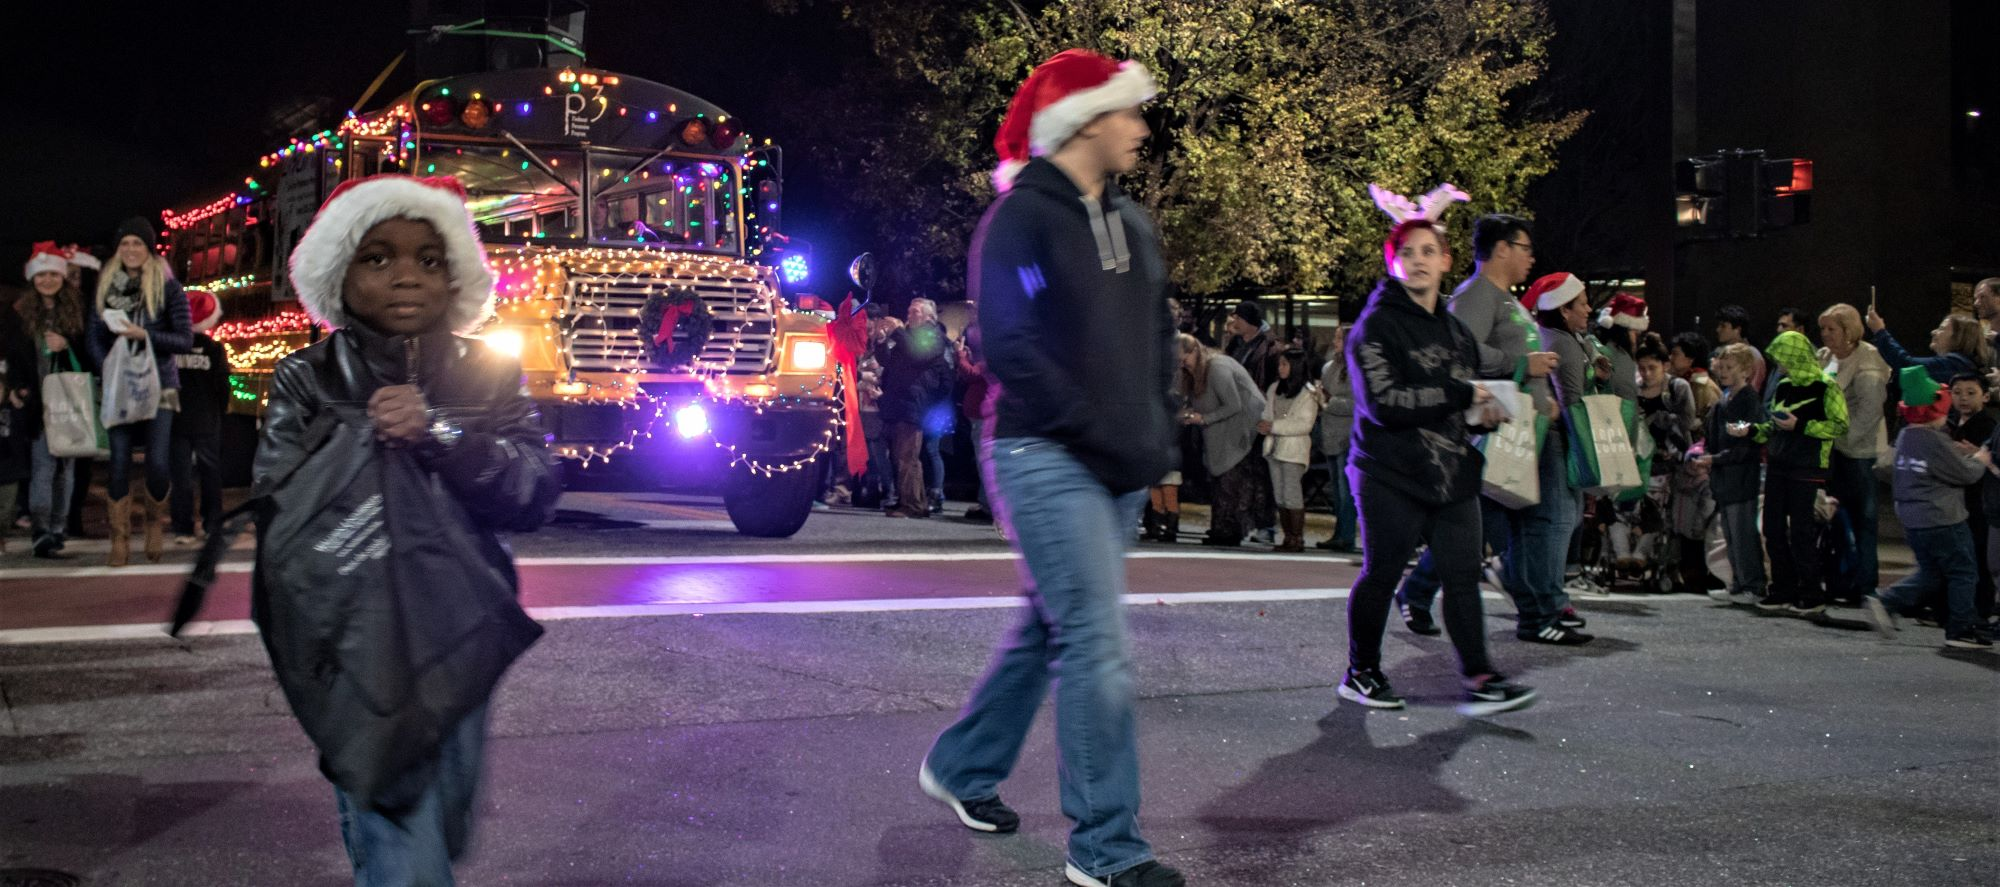 Newton Nc Christmas Parade 2020 Lowes Foods Christmas Parade and Tree Lighting | City of Hickory